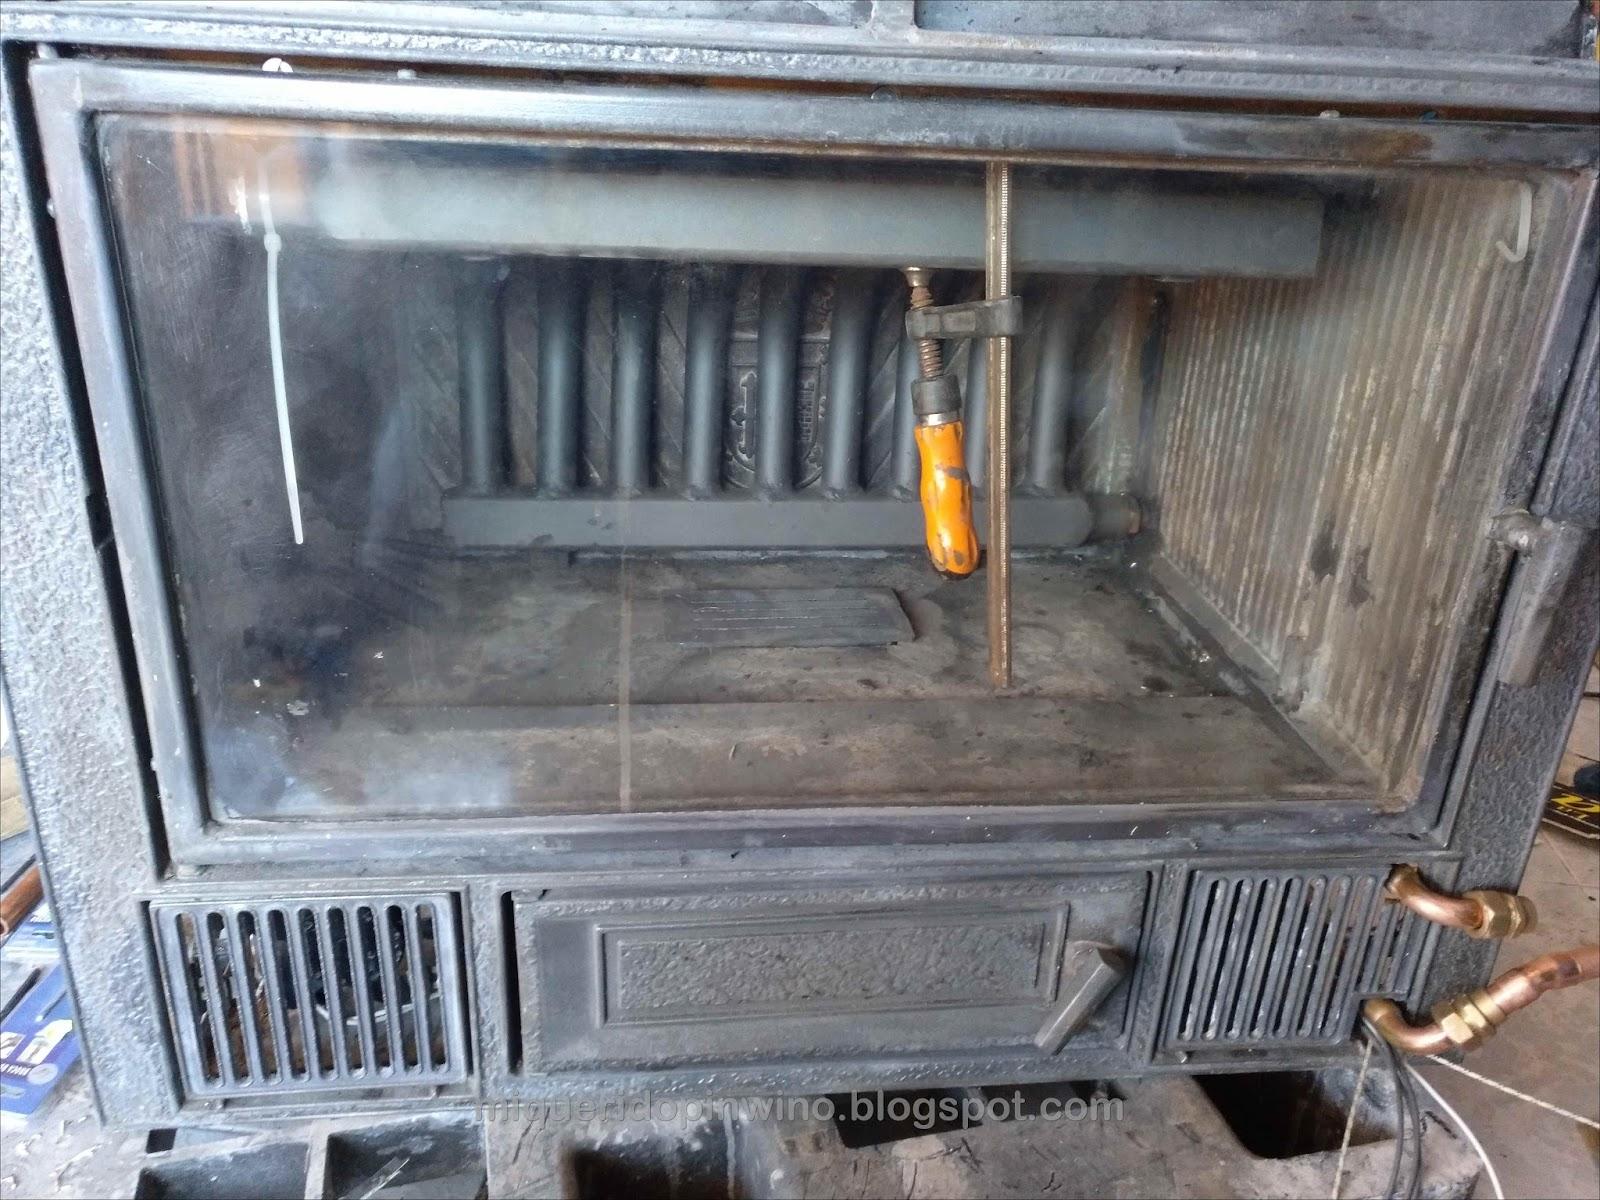 Tecnolog a para un progreso sostenible a adir un - Estufa de lena para radiadores ...